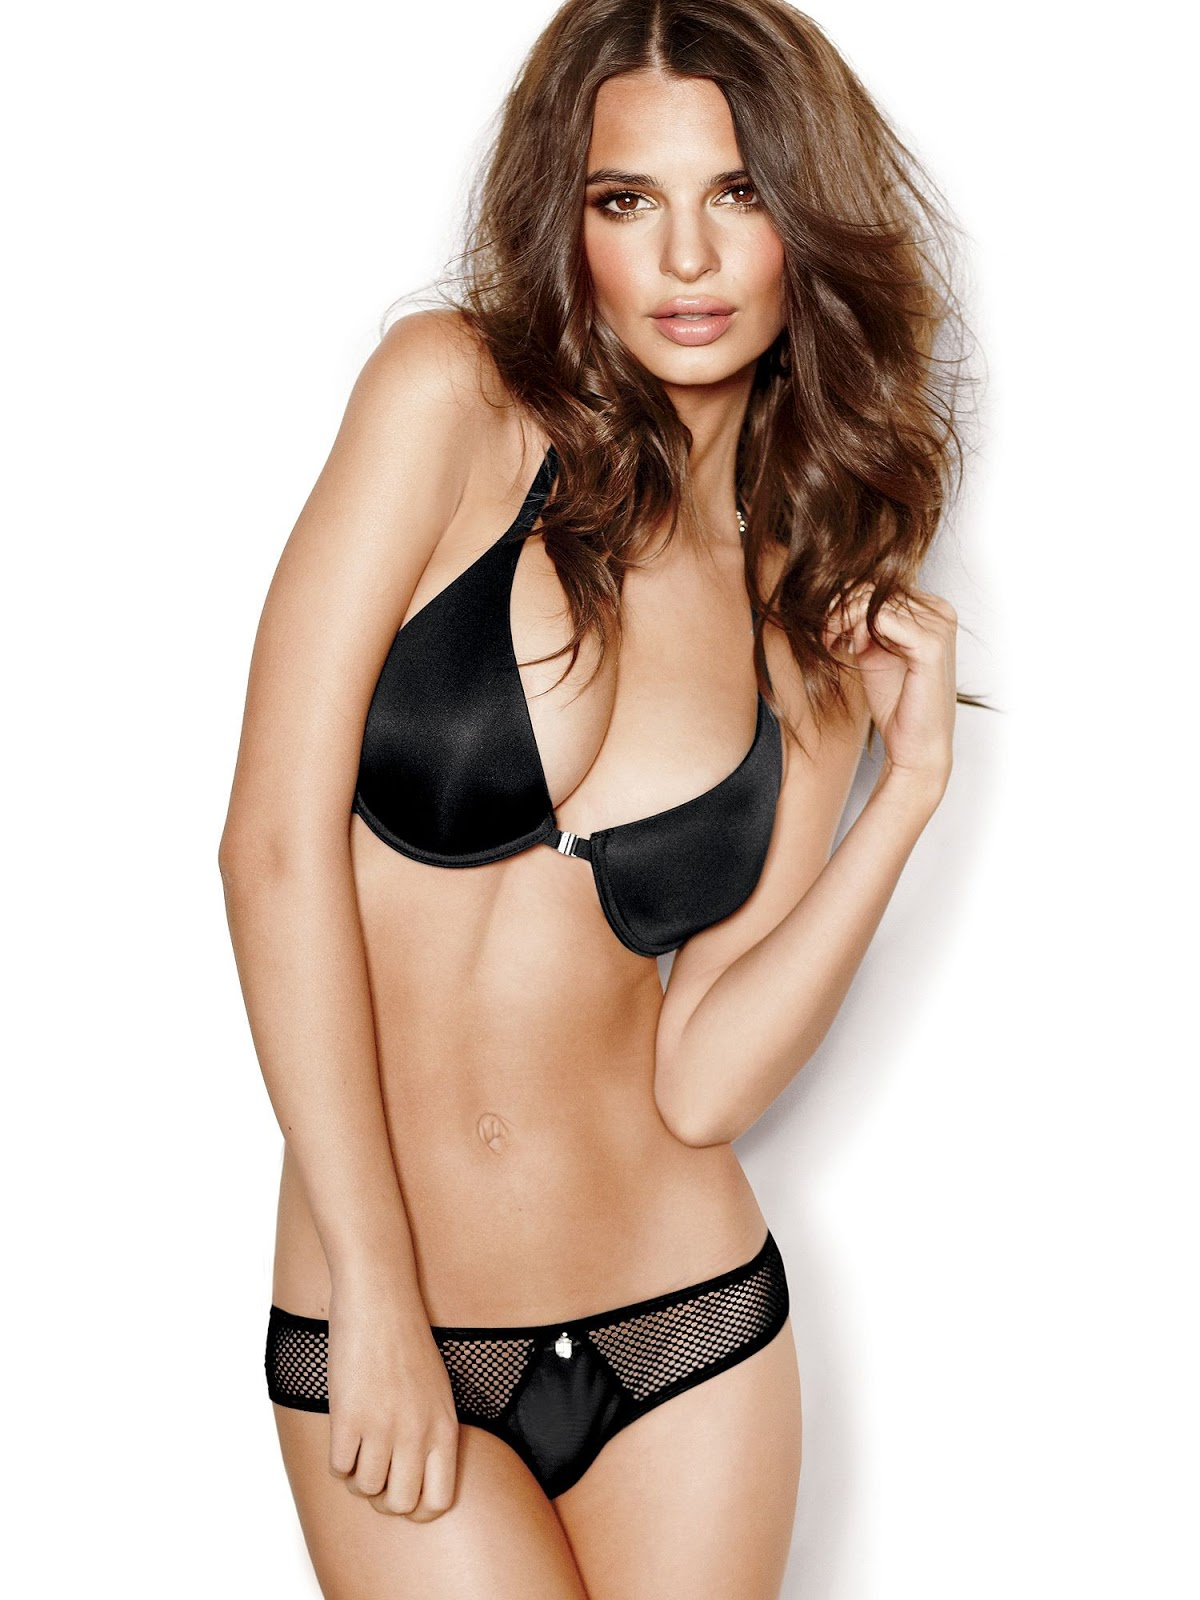 Bikini Jessi M?Bengue nudes (69 photos), Pussy, Bikini, Instagram, bra 2006